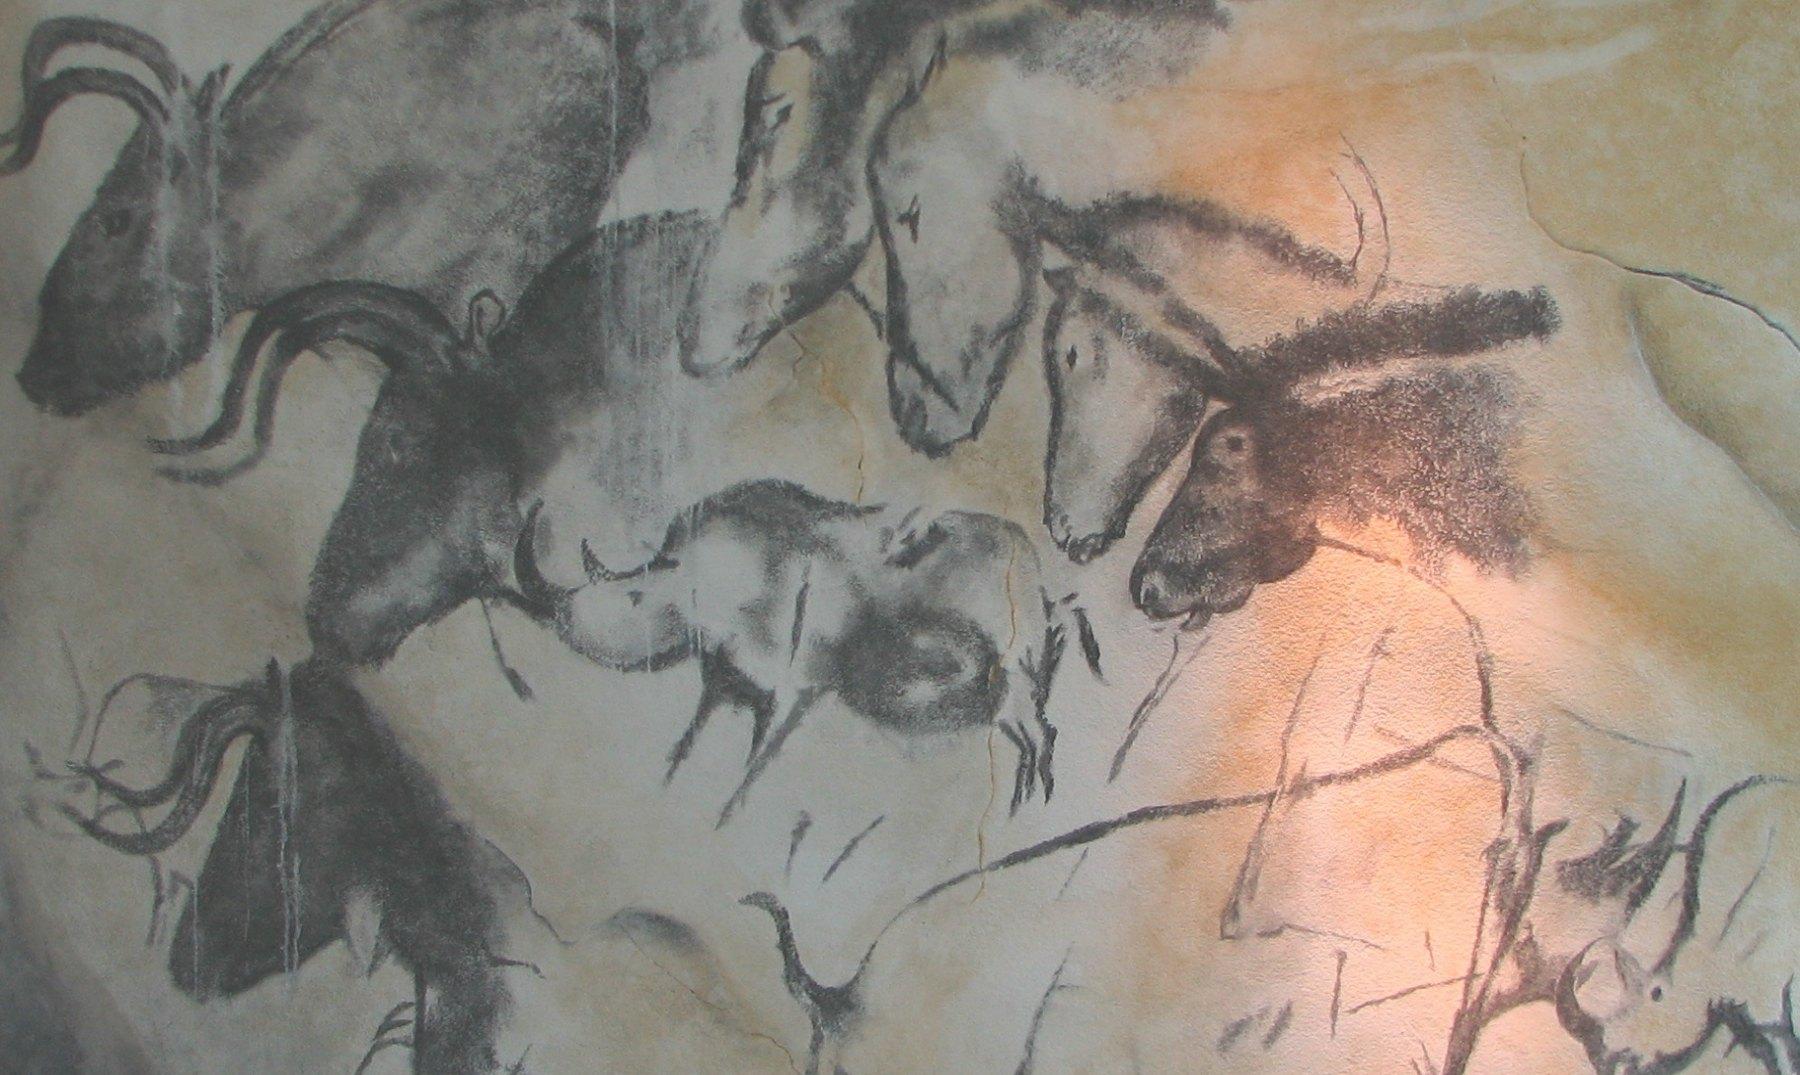 La sorprendente neocueva de Chauvet